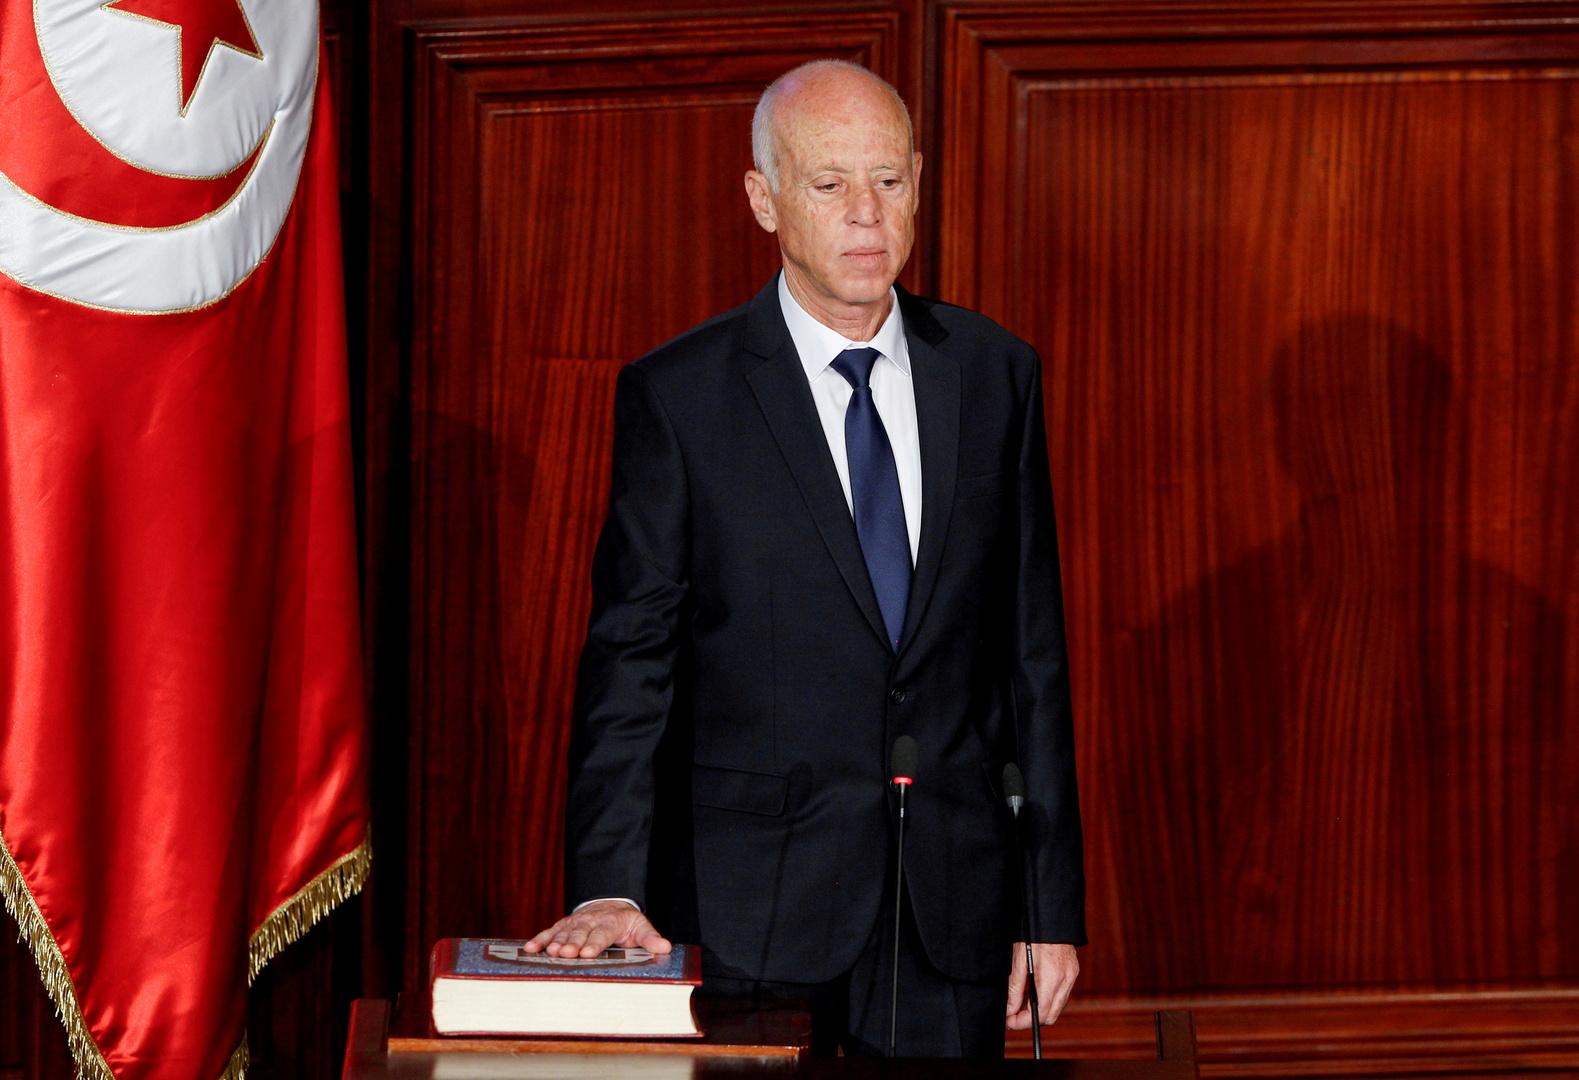 Roscosmos signs memorandum of understanding to send first Tunisian astronaut to International Space Station